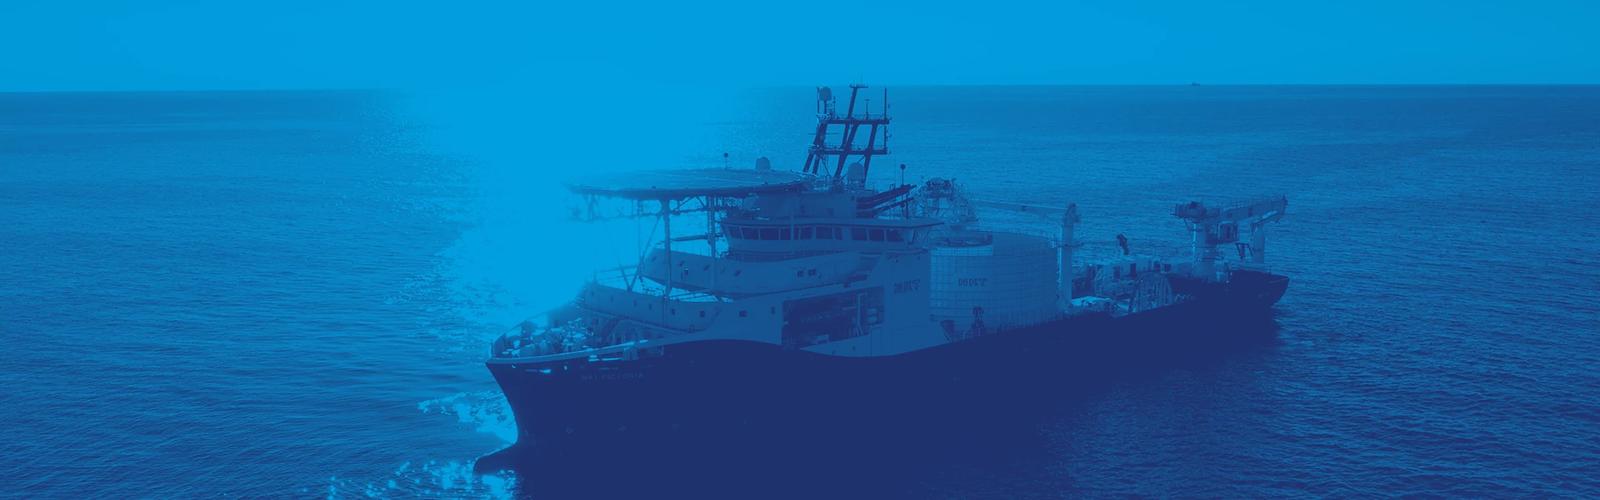 NKT Victoria, vessel